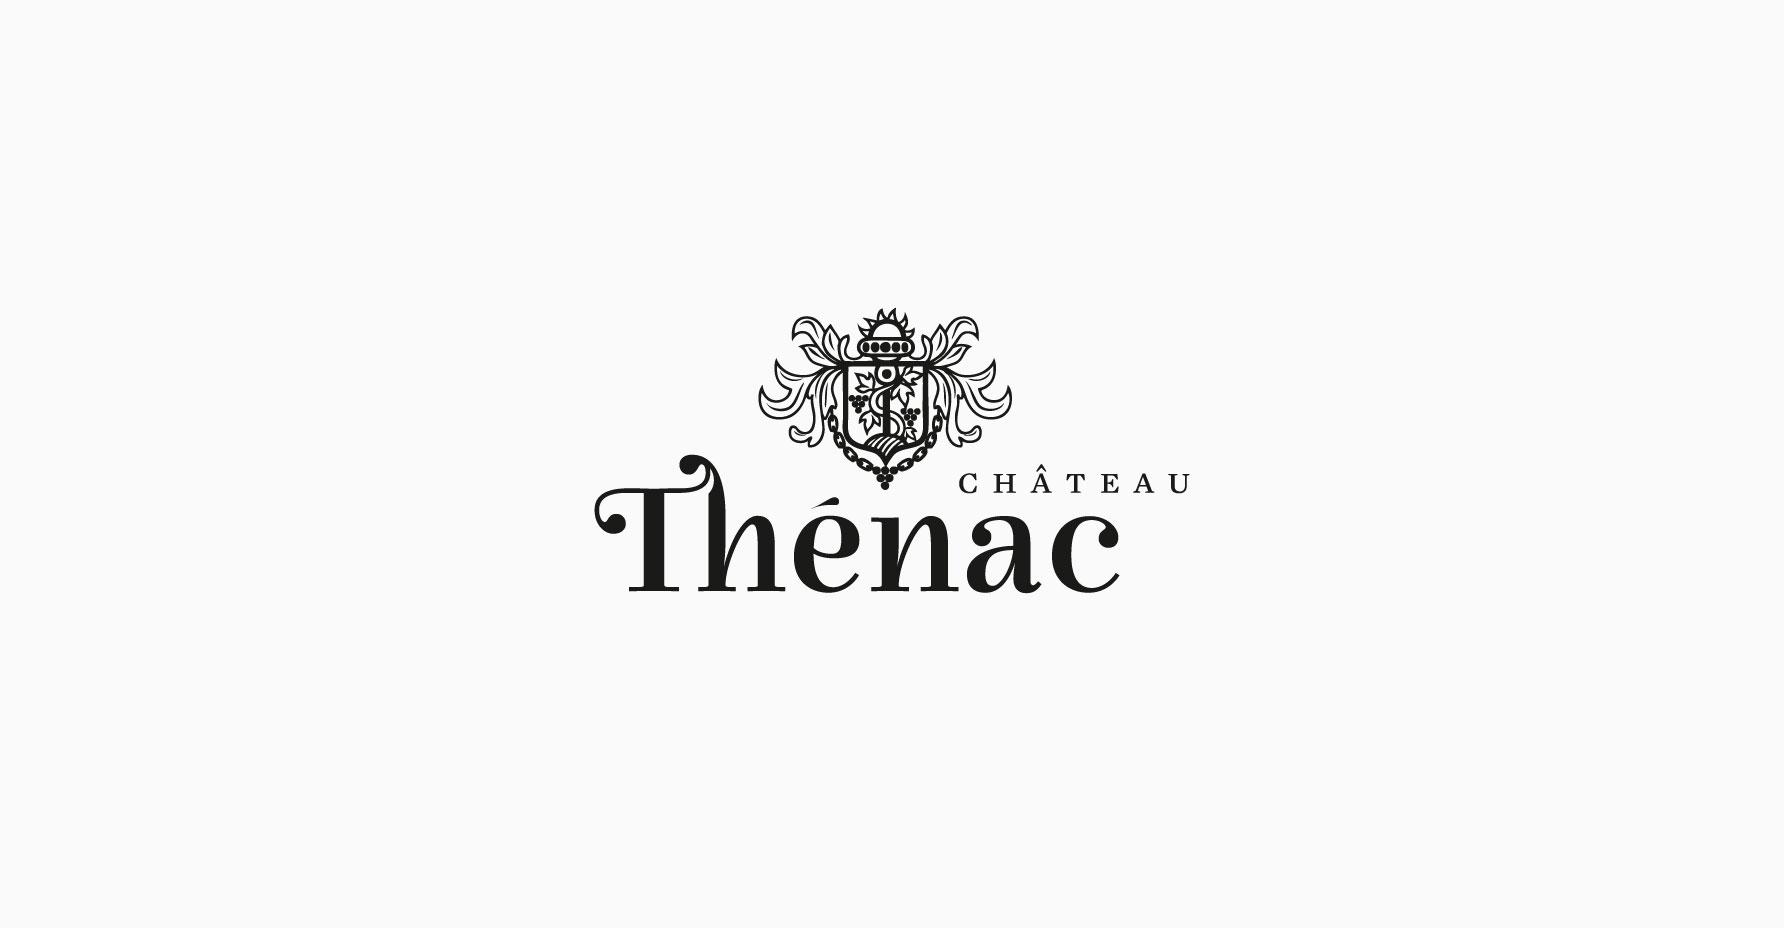 pict_thenac